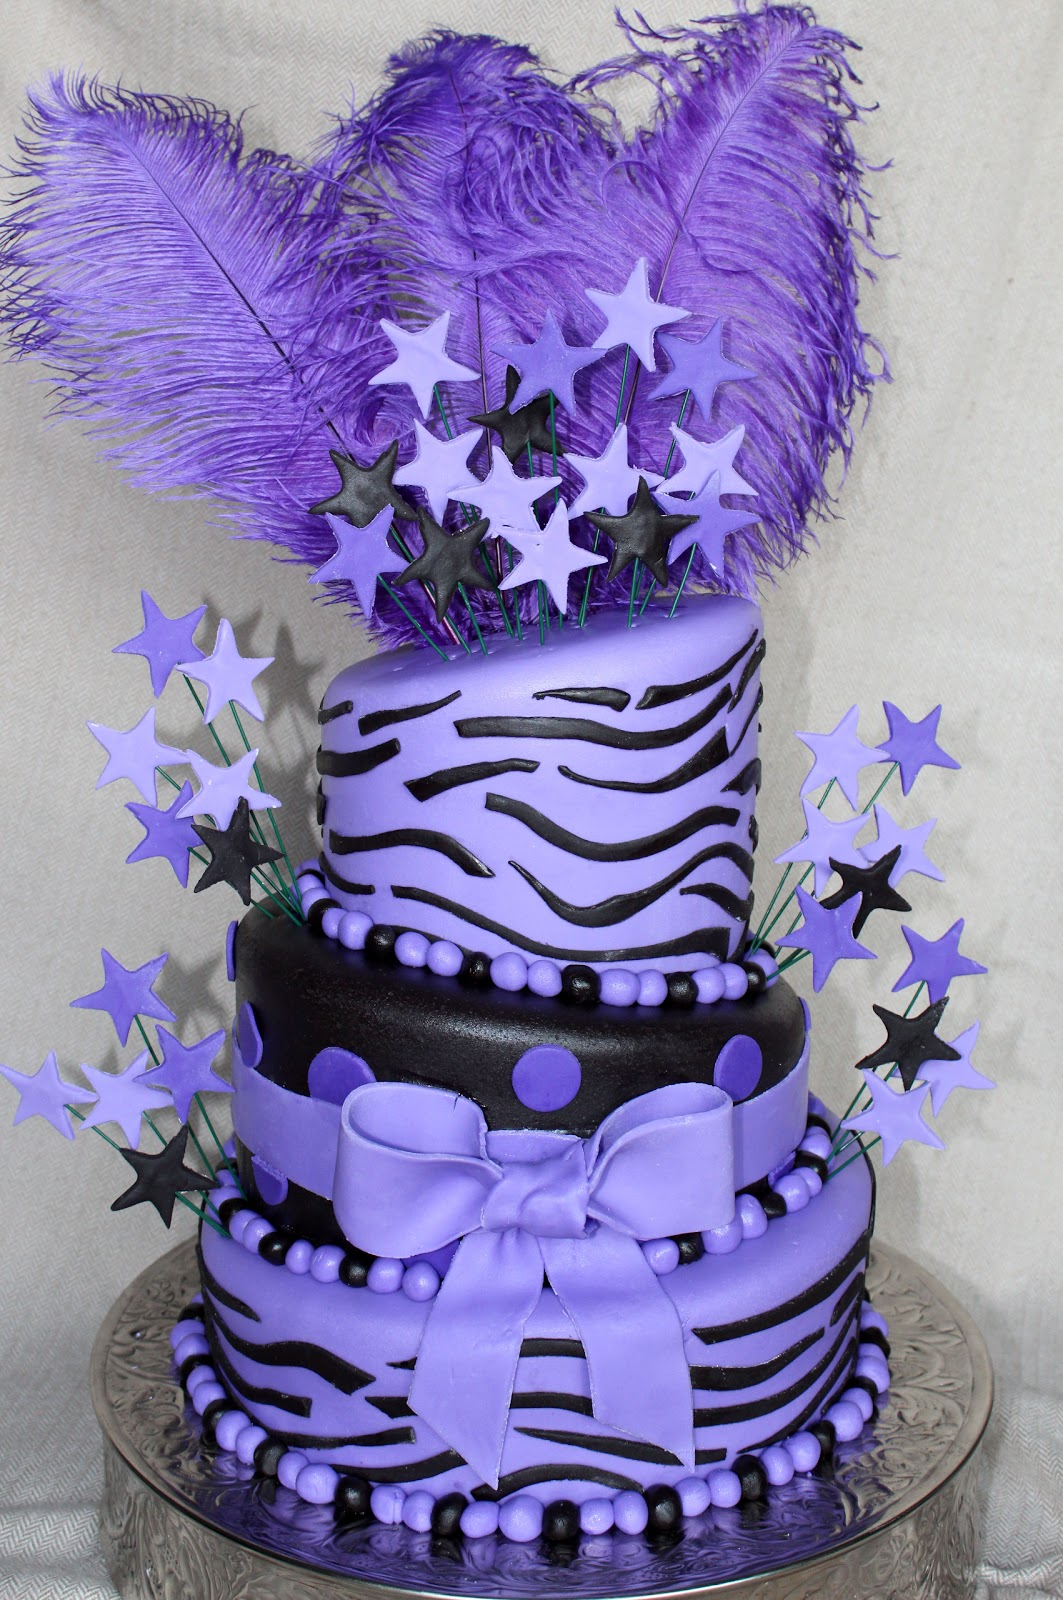 Images Of Purple Birthday Cake : Cake Flair: Purple Zebra and Feathers Cake